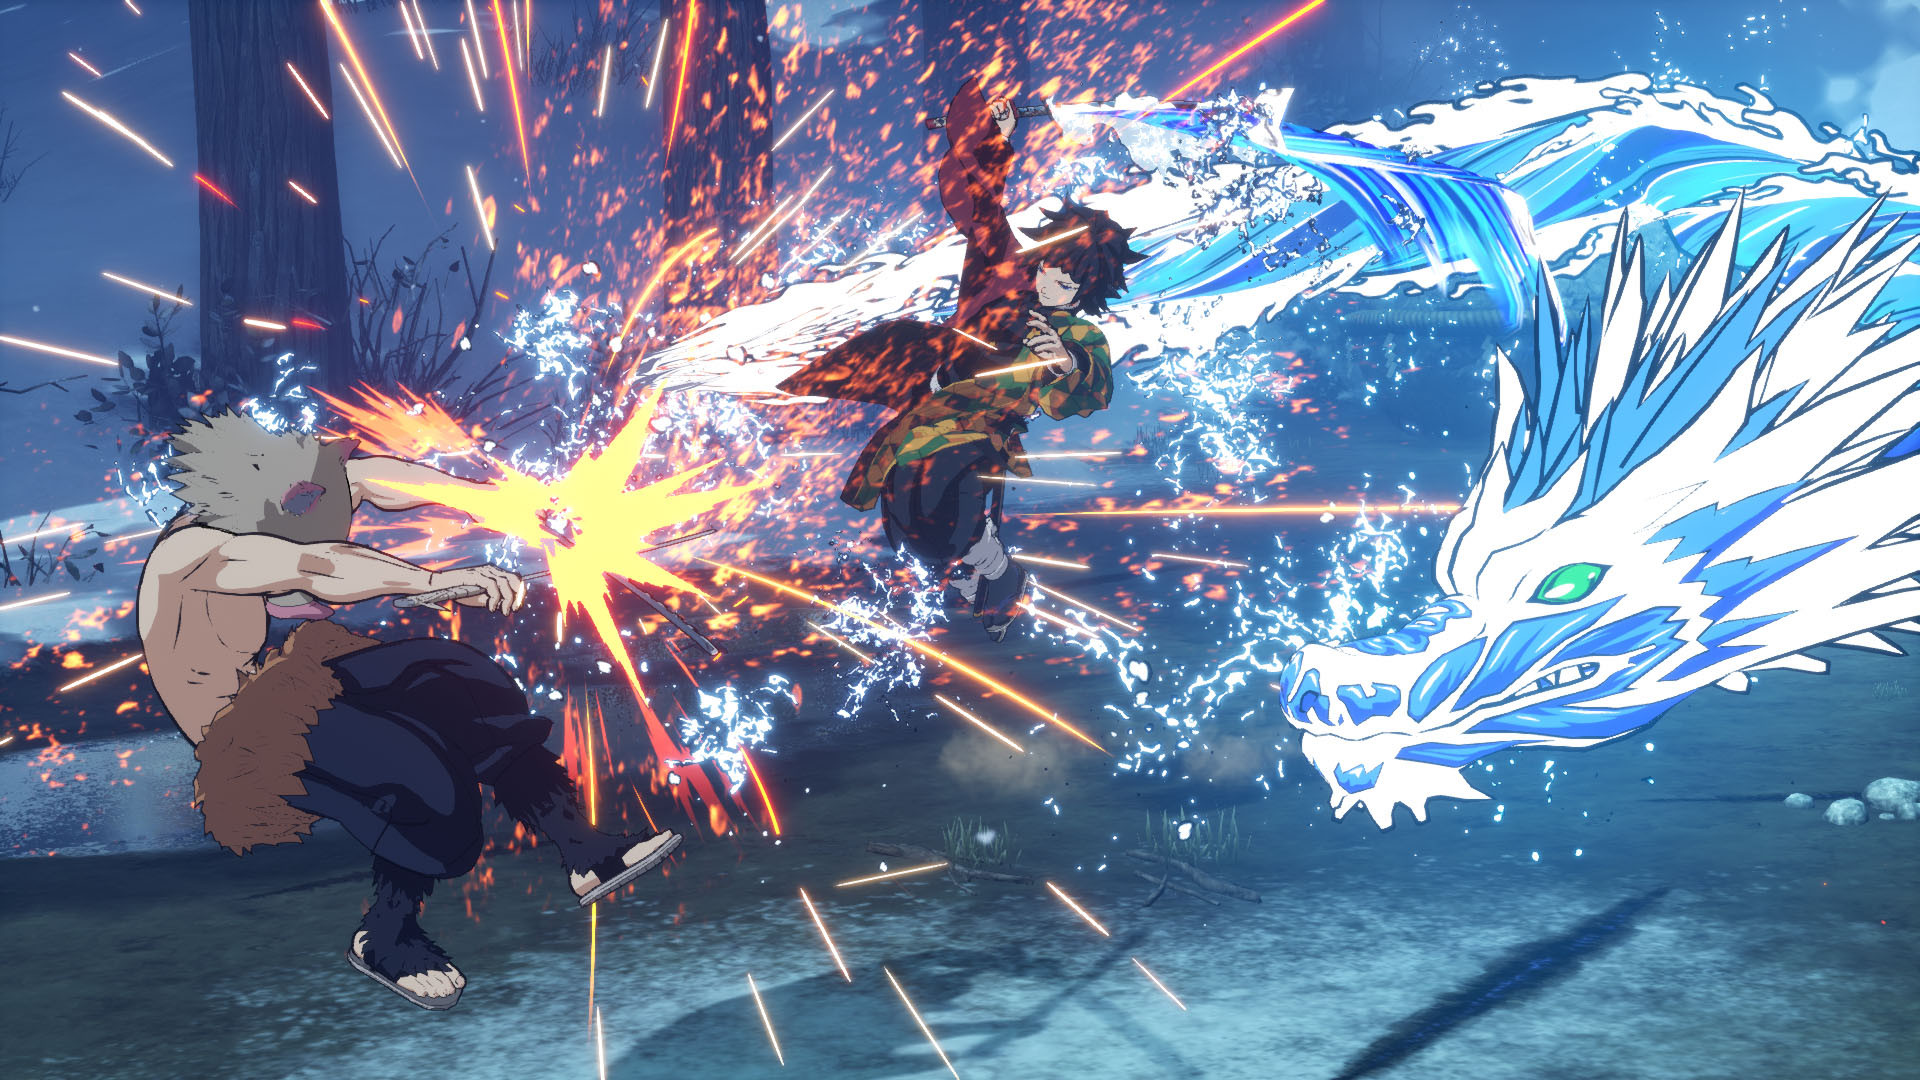 Xbox Series X & S Demon Slayer: Hinokami Keppûtan